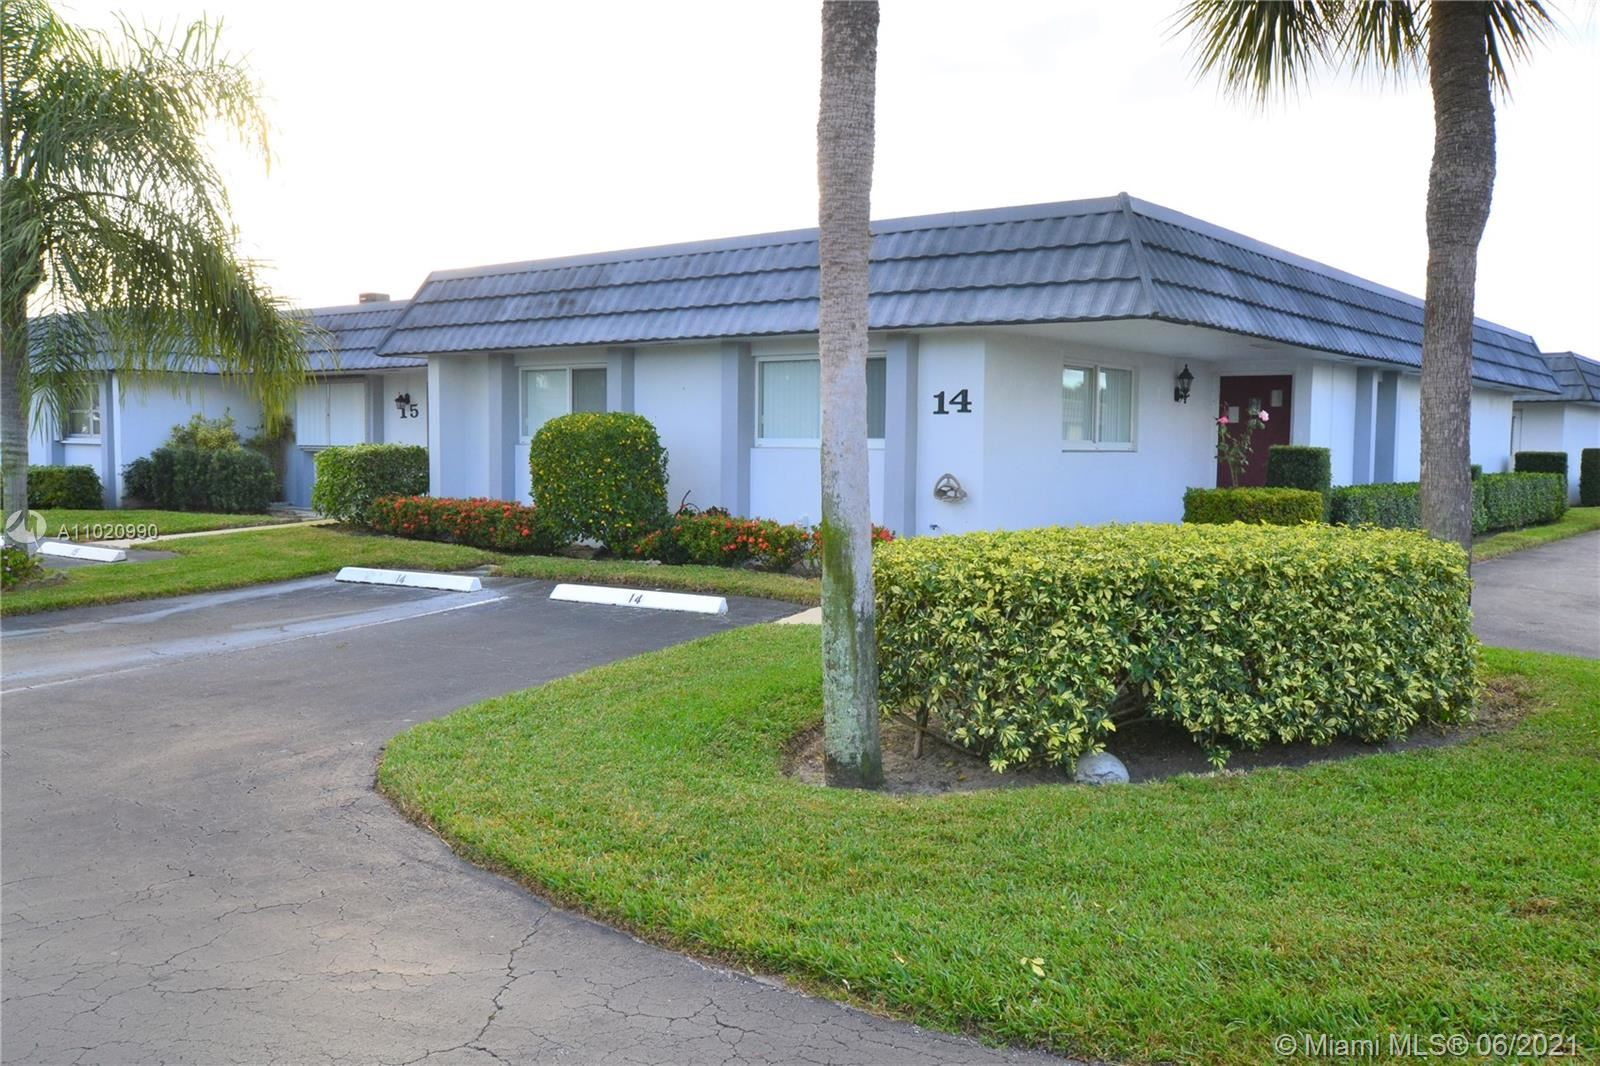 2886 Fernley Dr E #14, West Palm Beach, FL 33415 - #: A11020990